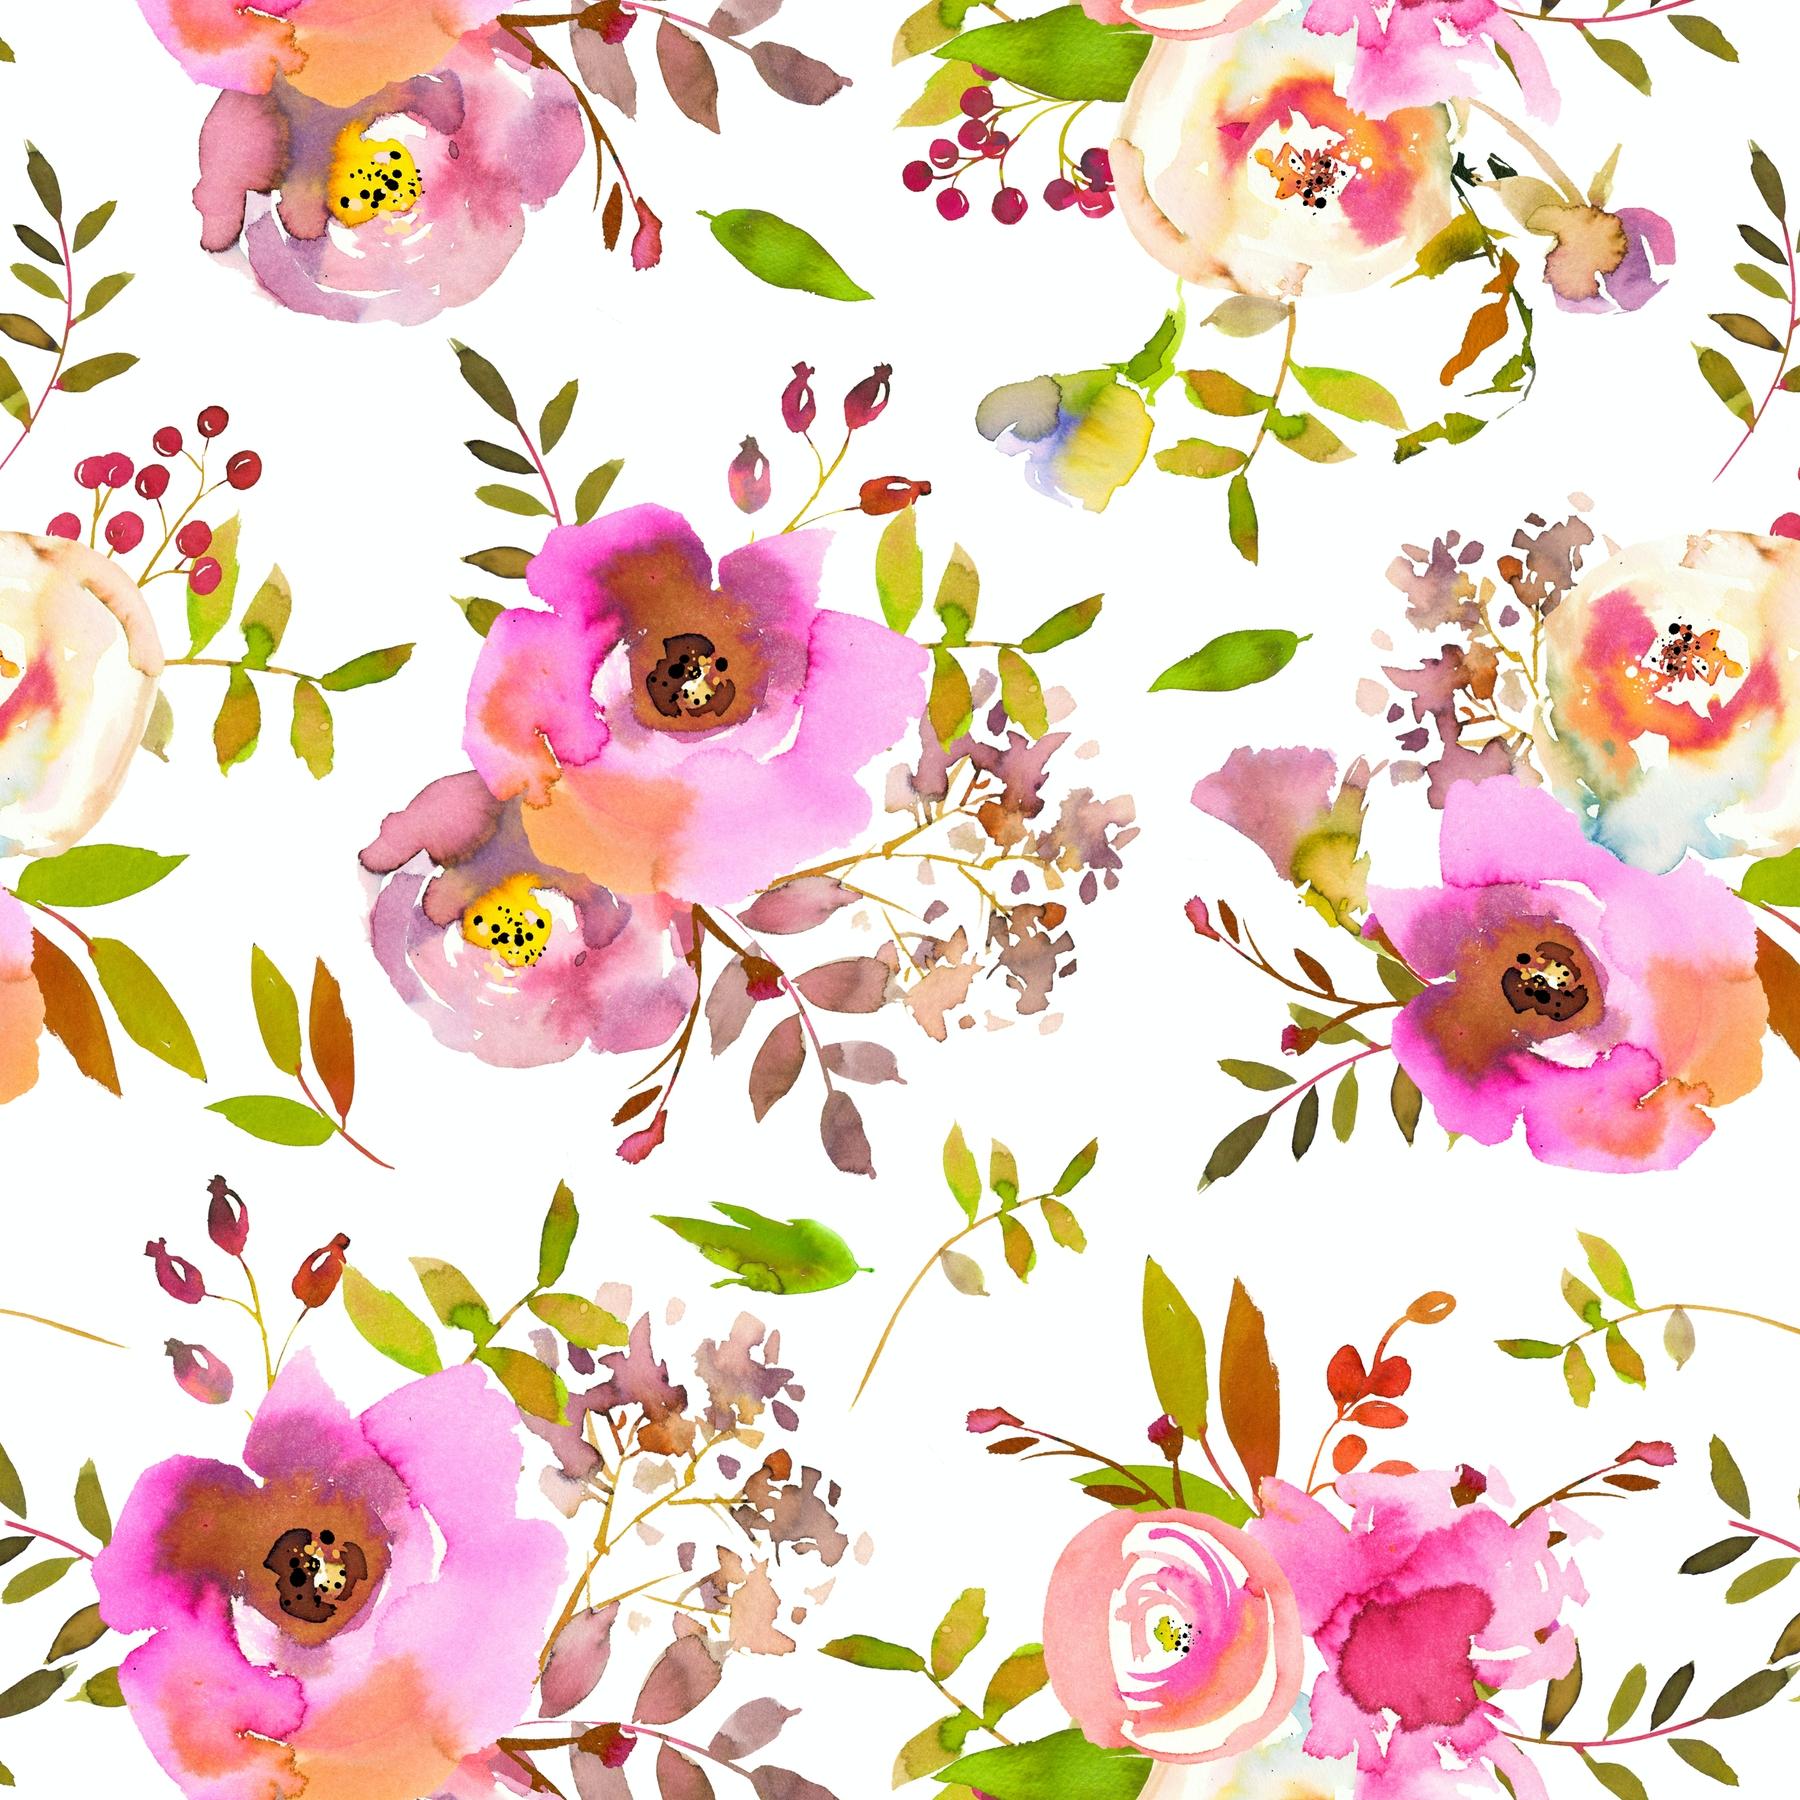 Buy Pink Boho Flowers Wallpaper Free Us Shipping At Happywall Com